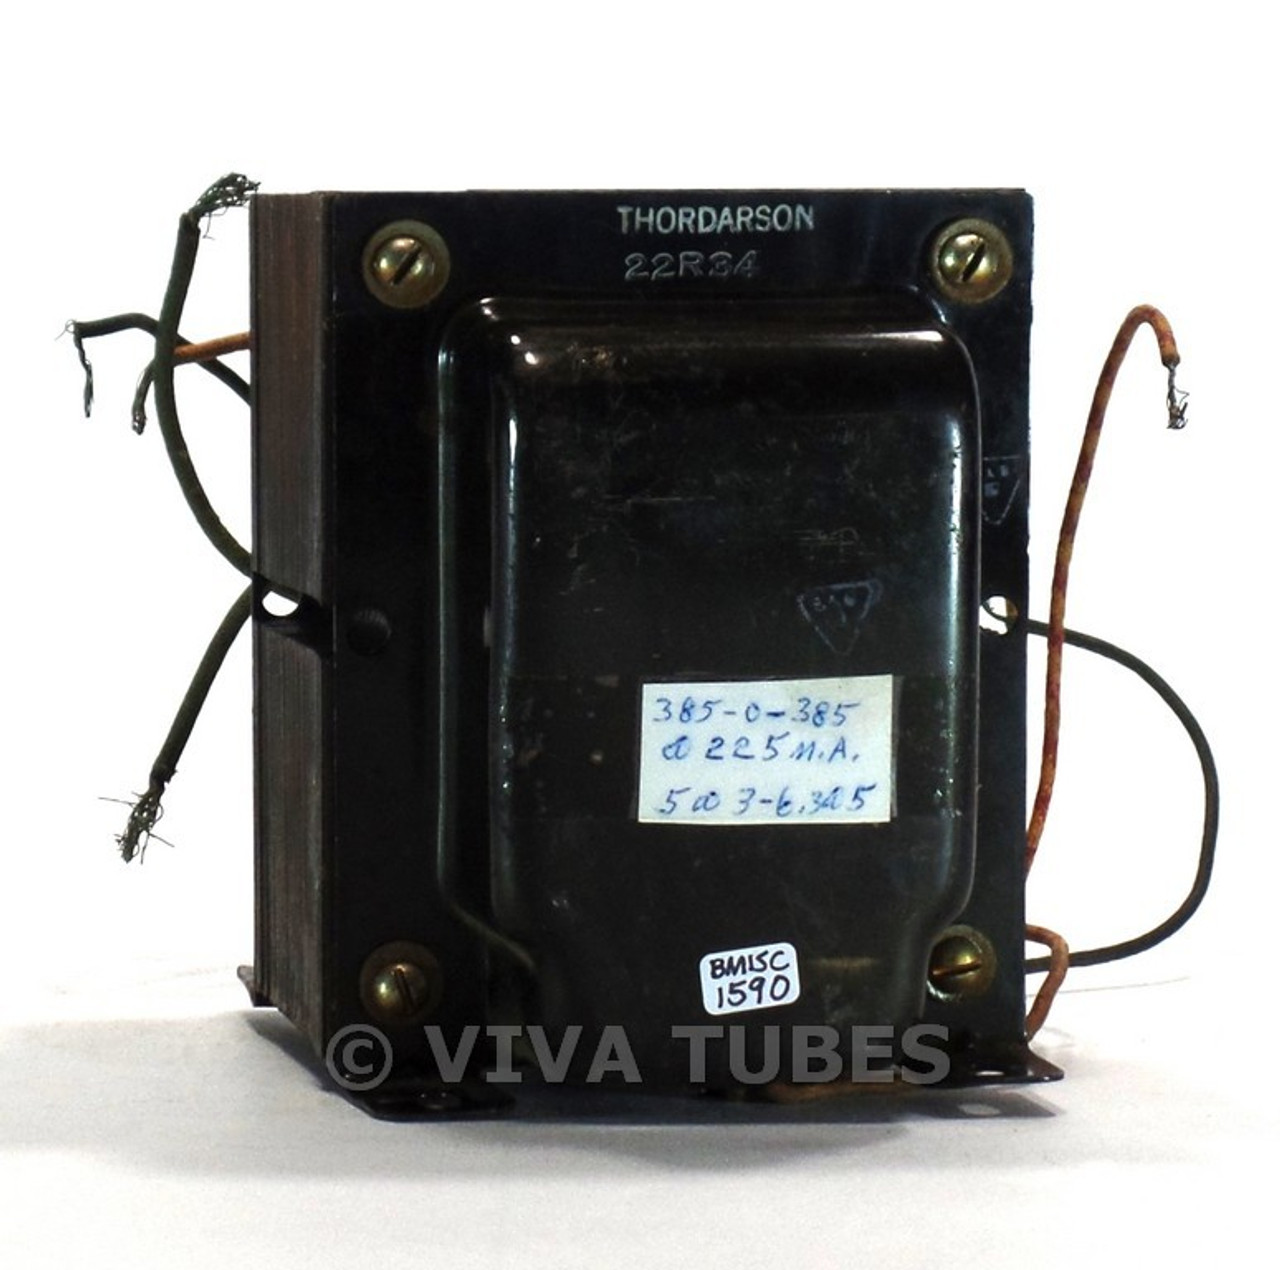 vintage thordarson 22r34 power